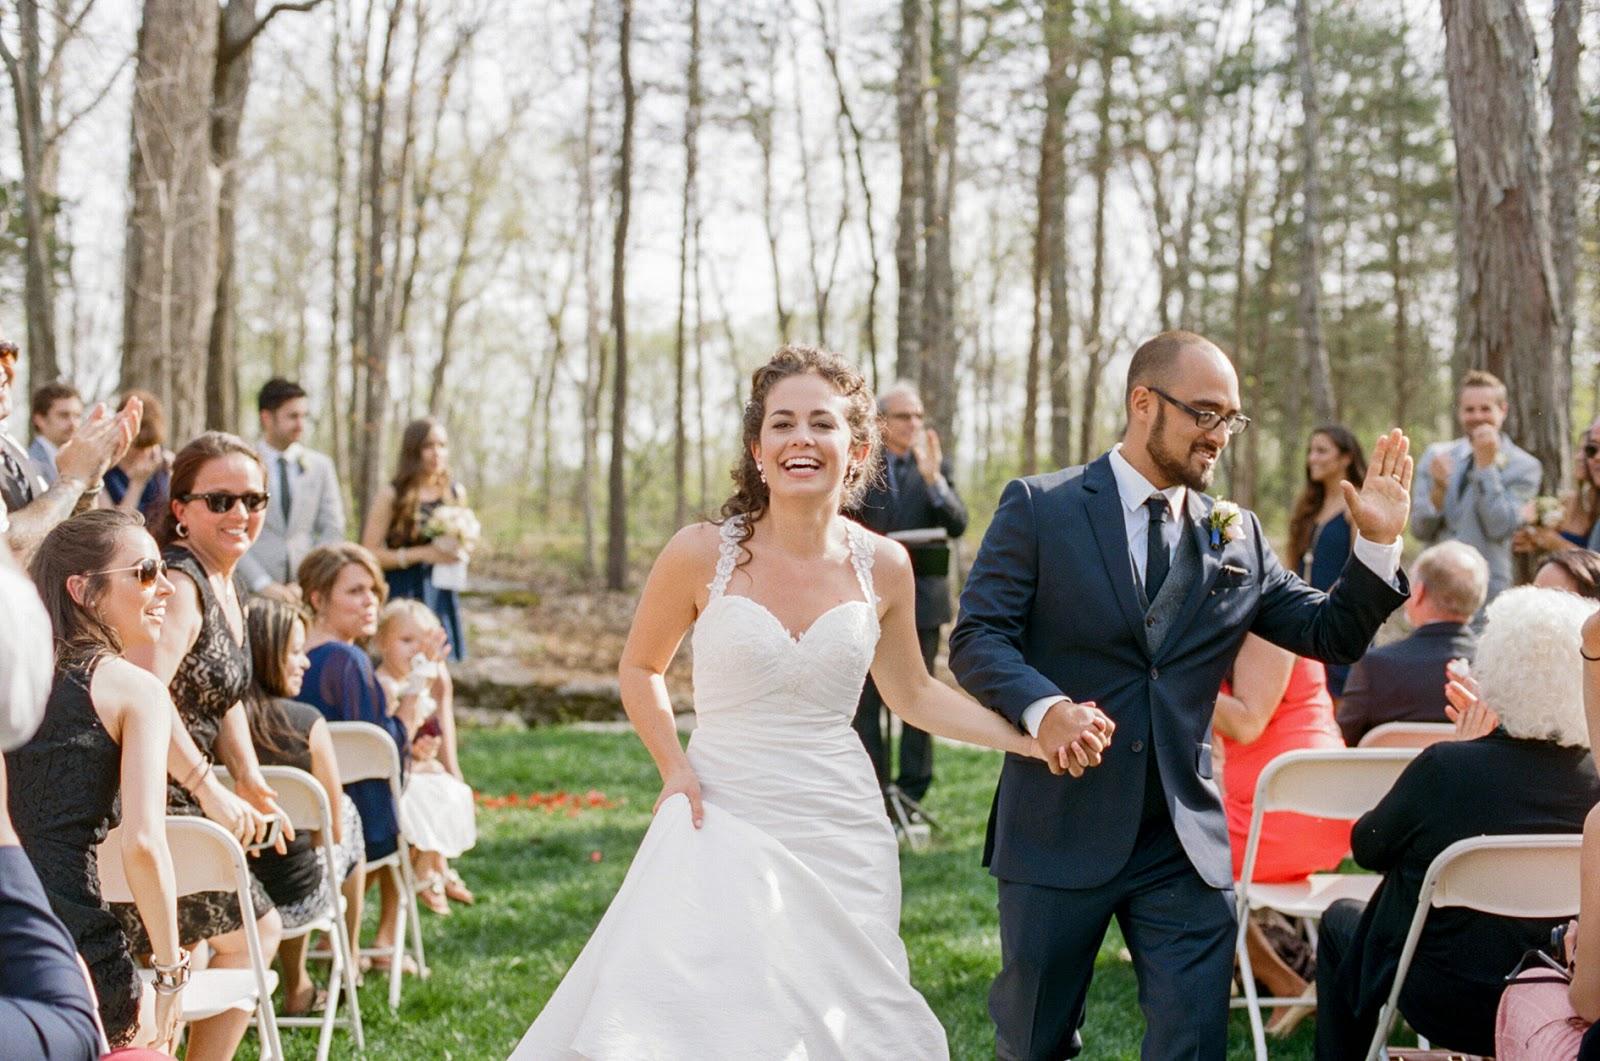 The Rustic Wedding – Part I